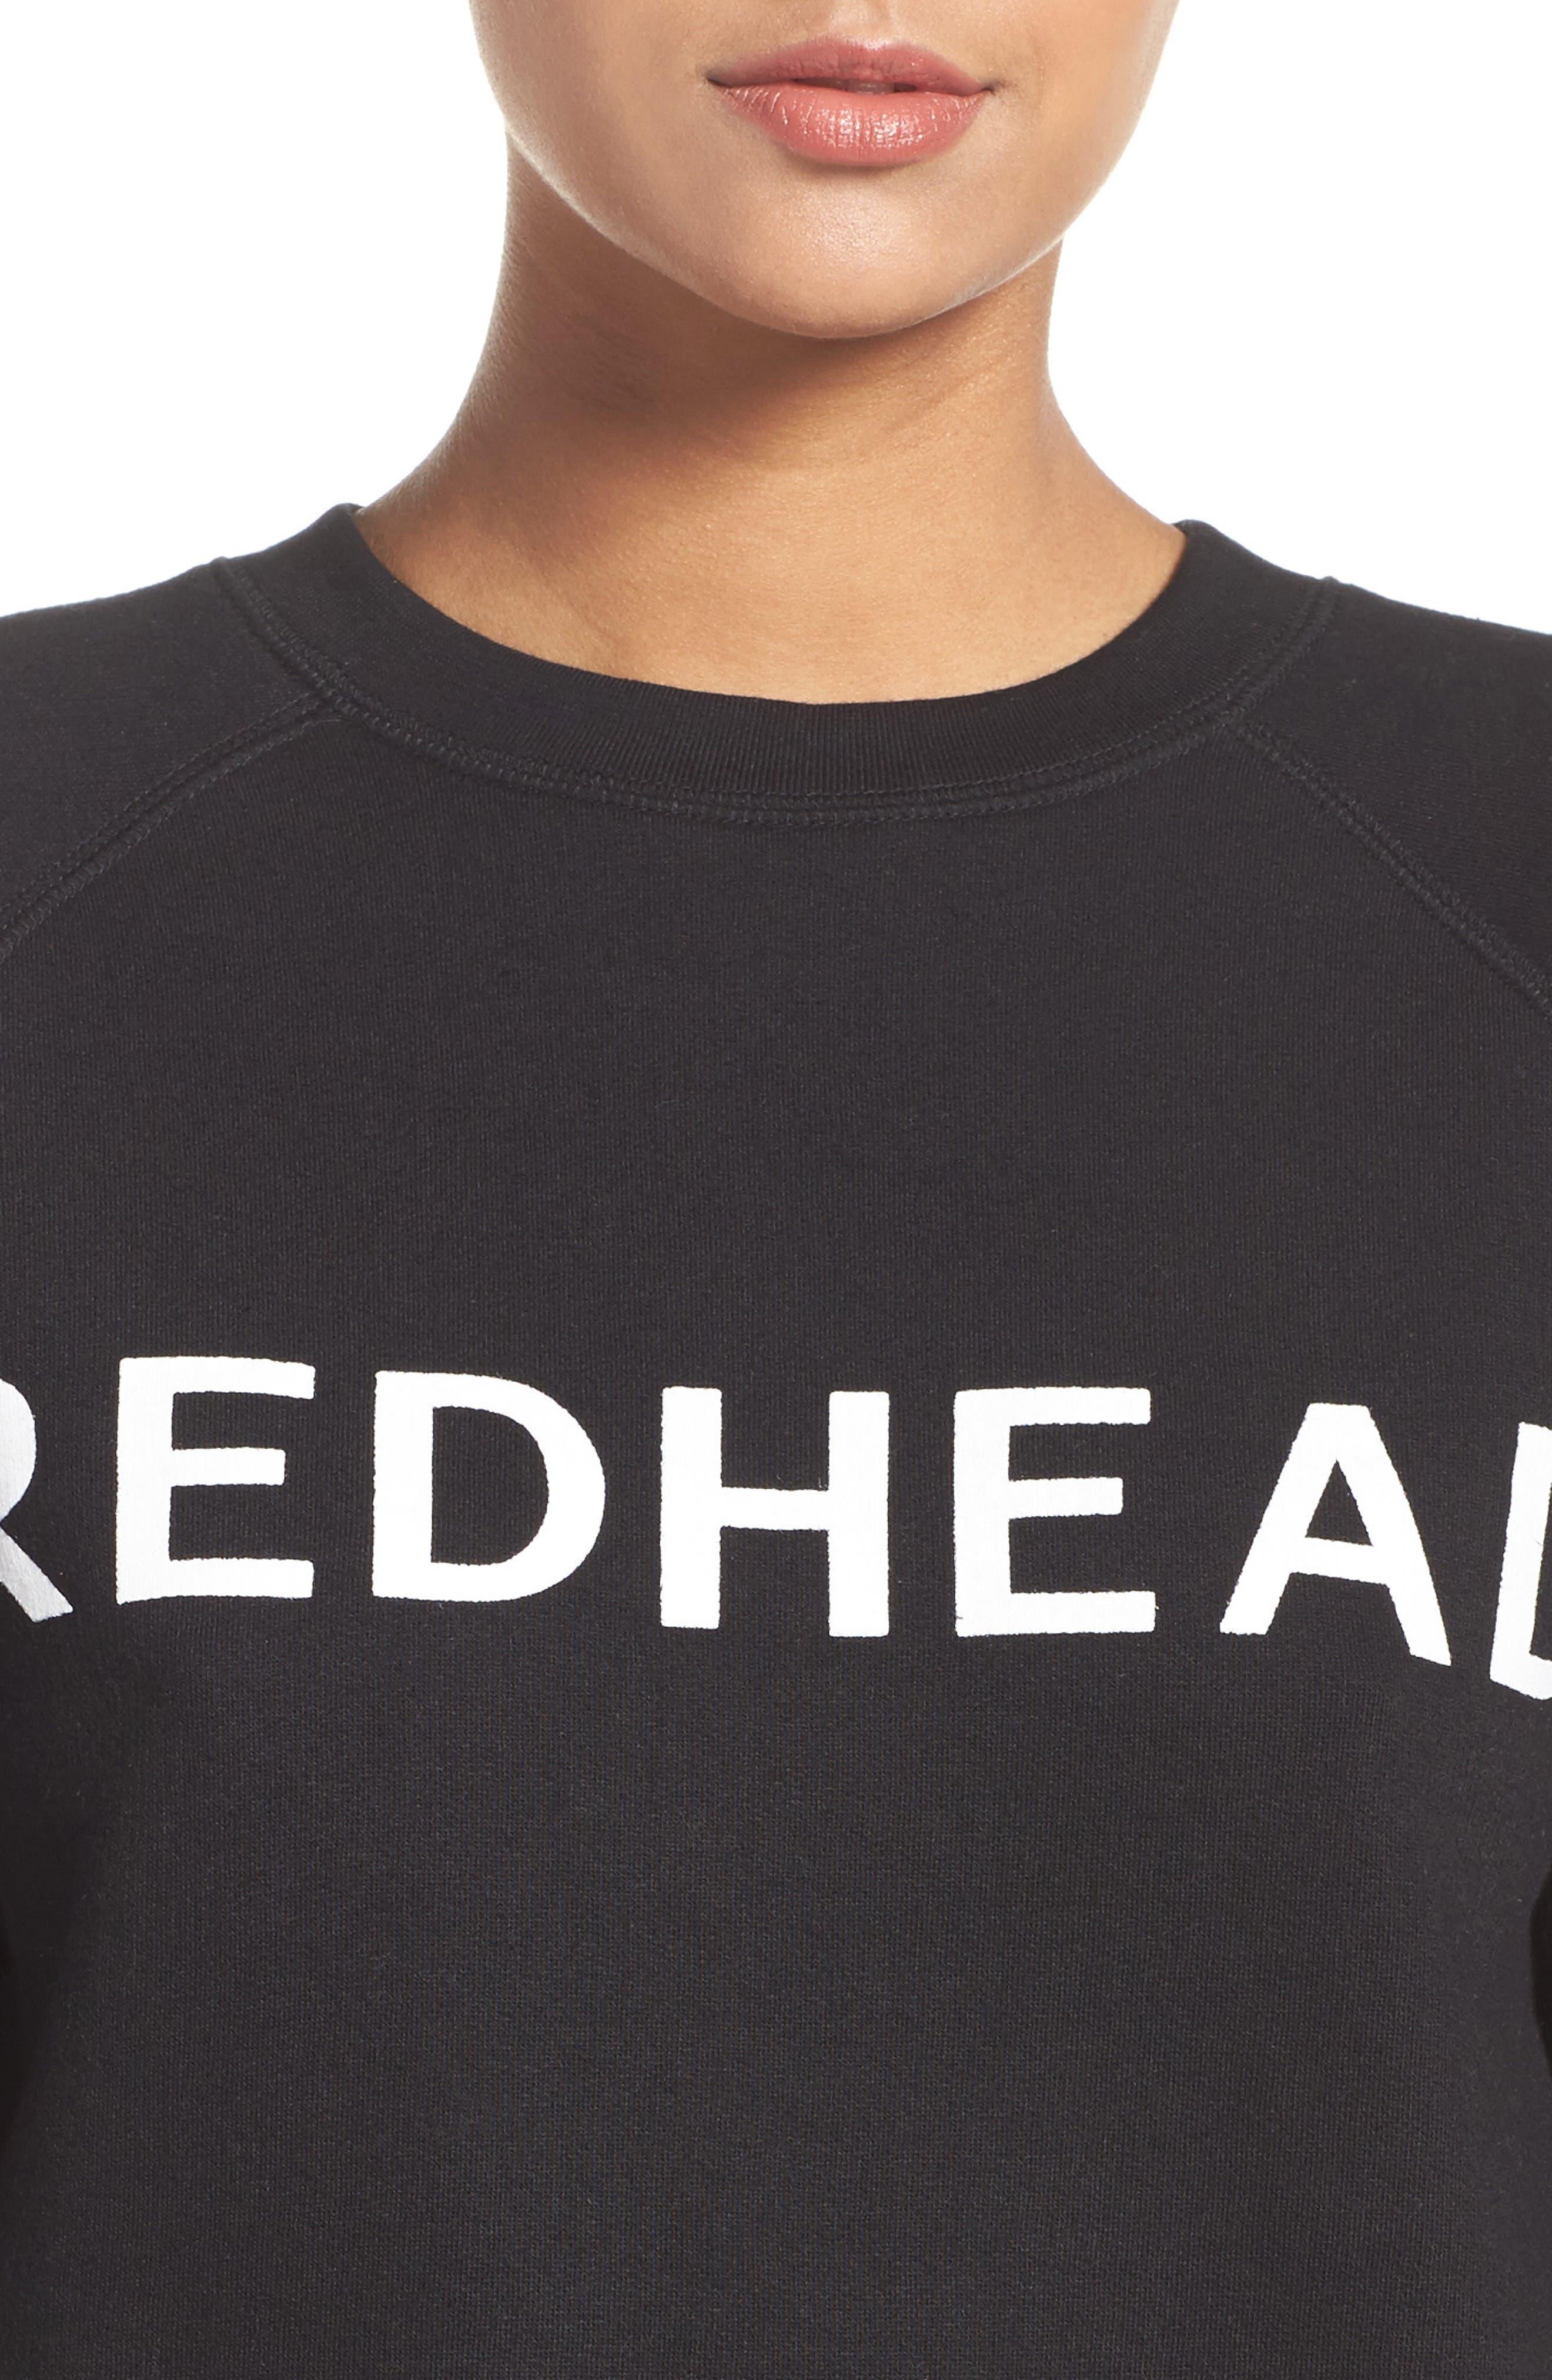 Redhead Lounge Sweatshirt,                             Alternate thumbnail 4, color,                             001